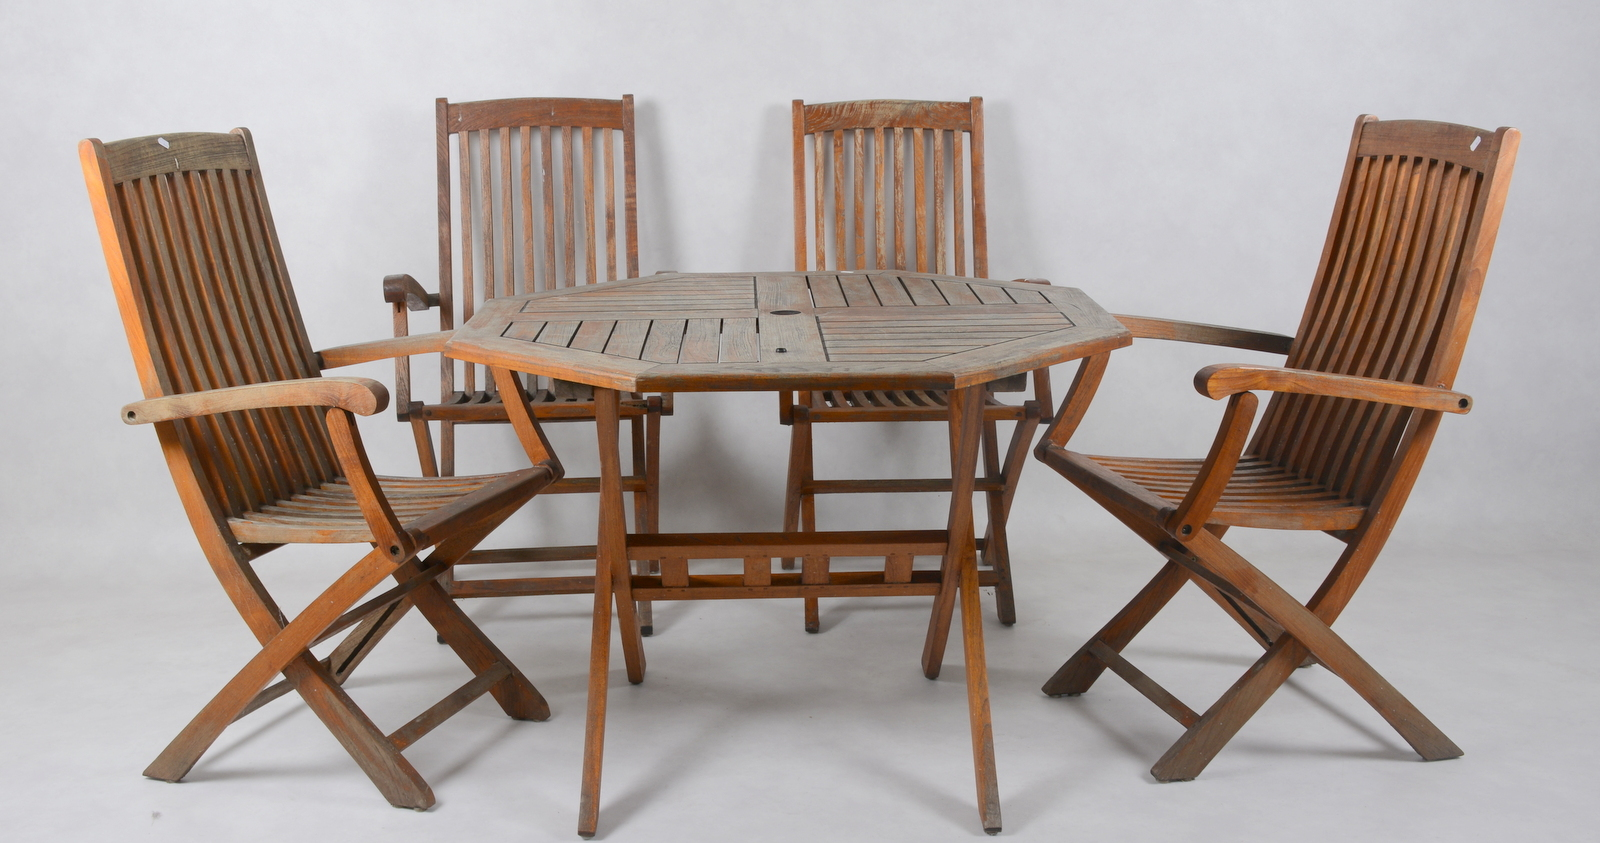 Beau TRÄDGÅRDSMÖBLER, Beaufort 10, 5 Delar. Furniture   Garden Furniture    Auctionet